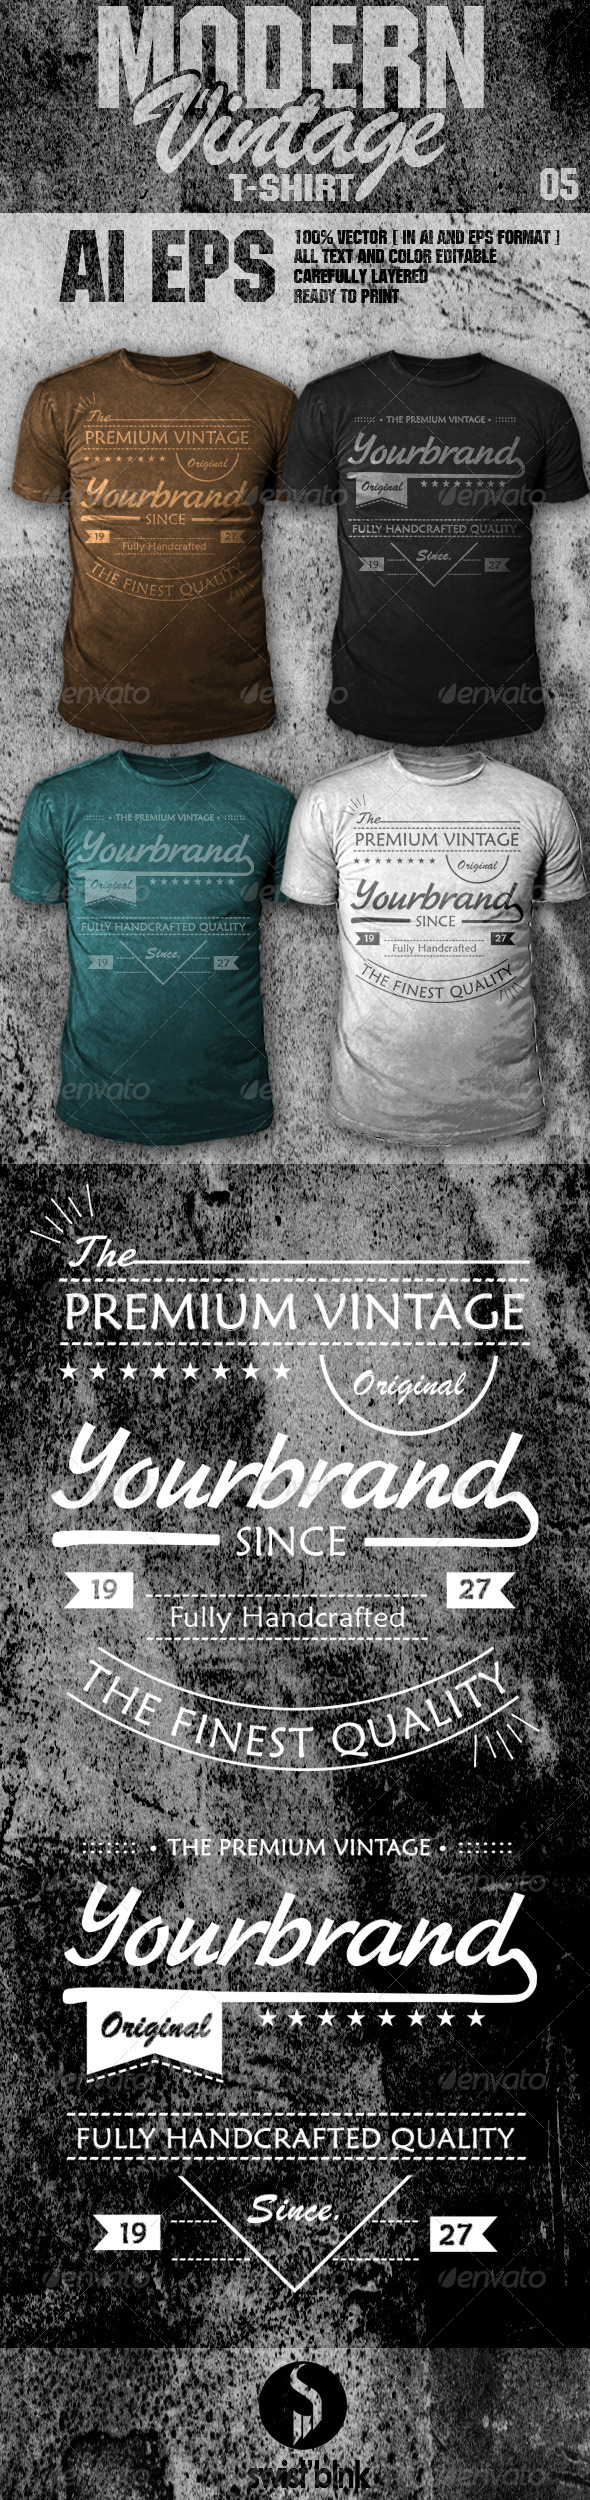 GraphicRiver Modern Vintage T-Shirt 05 6842095